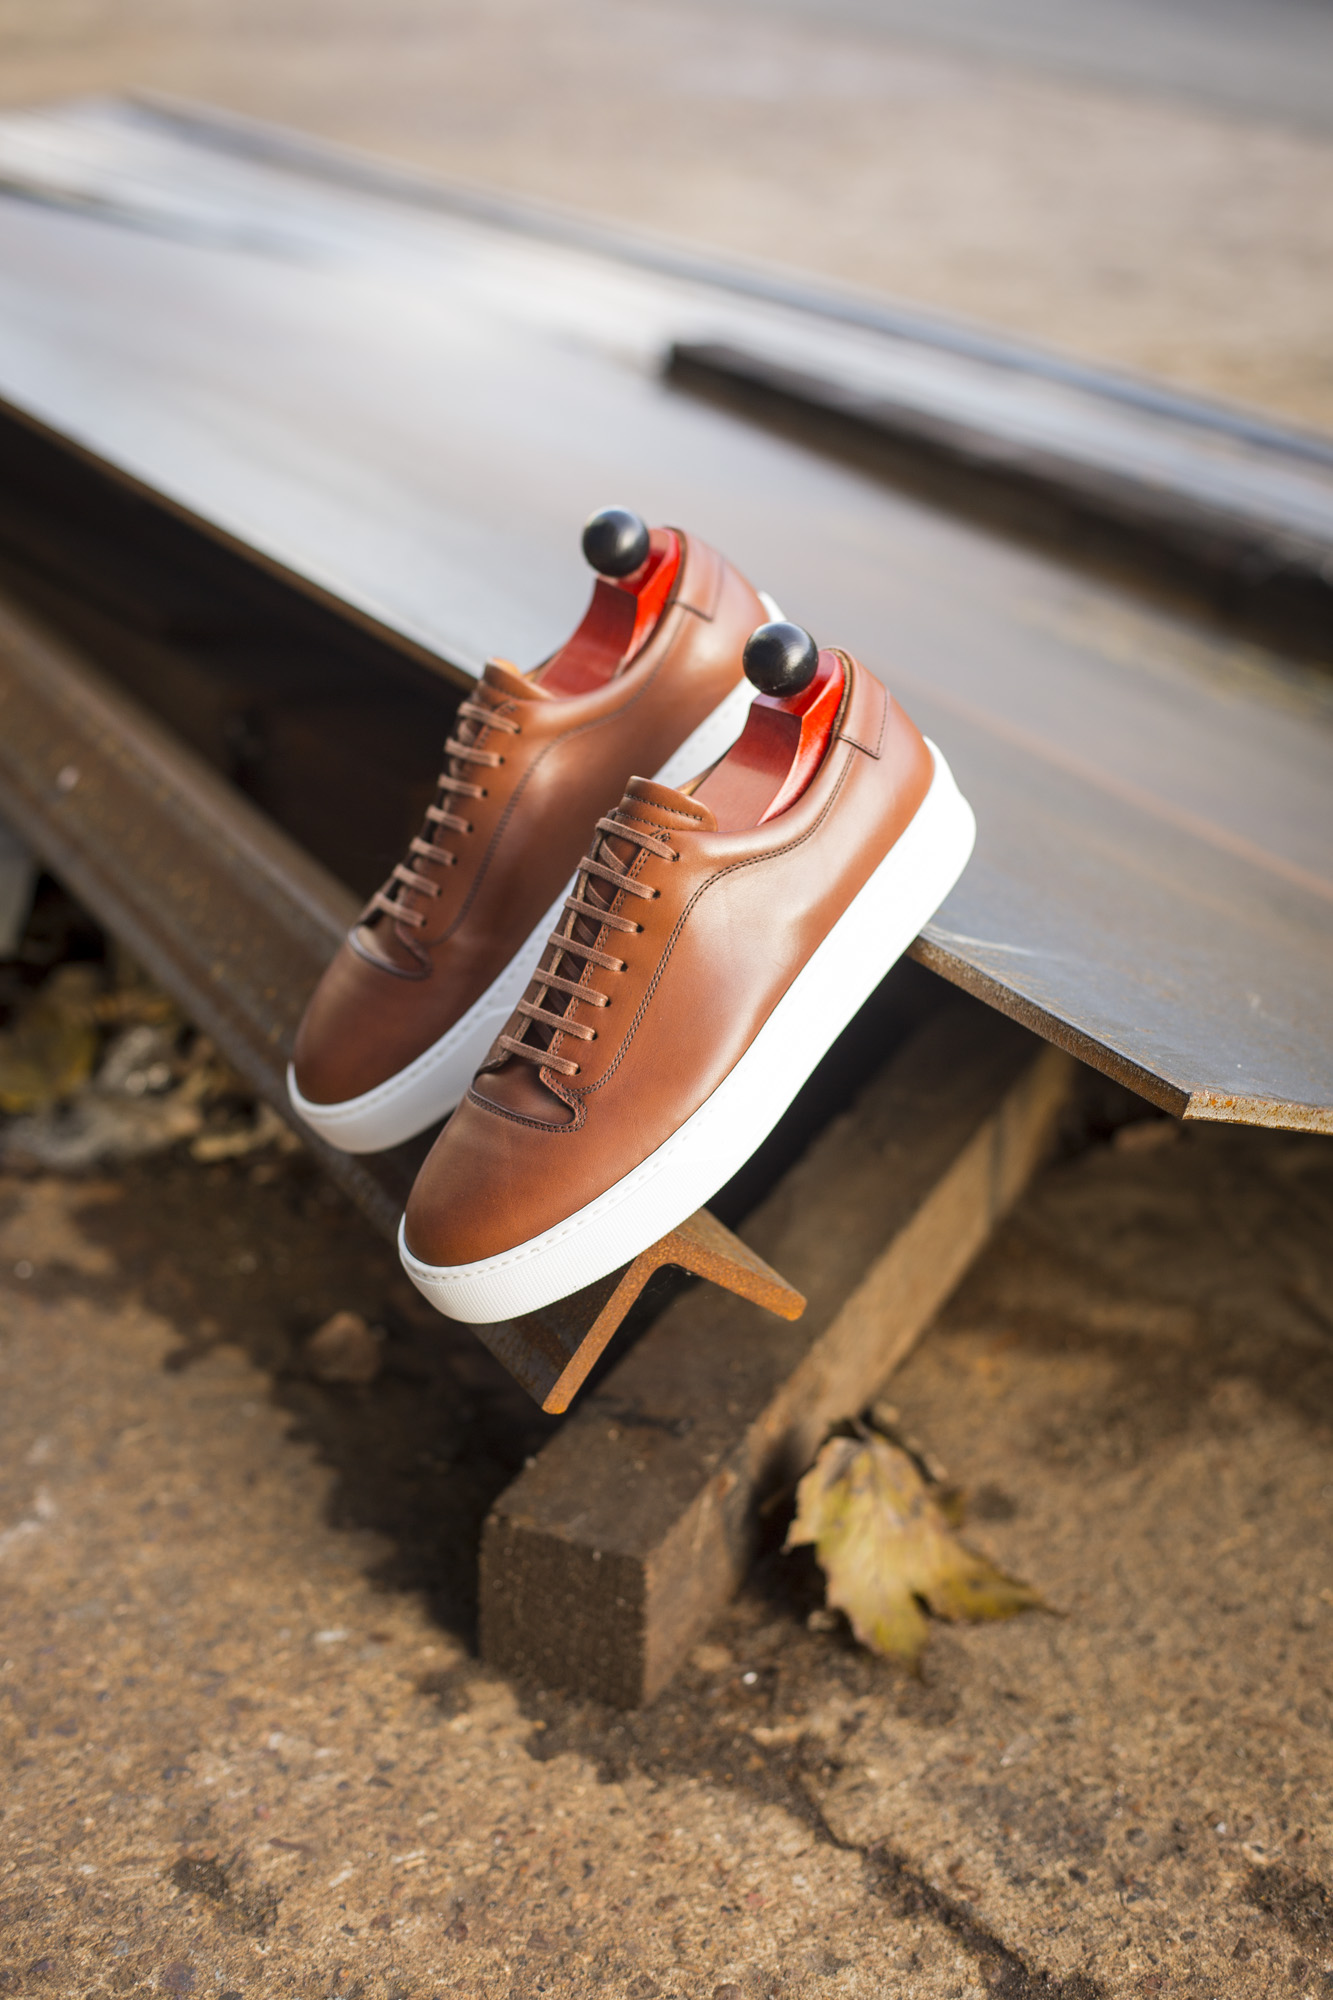 j-fitzpatrick-footwear-collection-9-november-2017-hero-trainers-0091.jpg